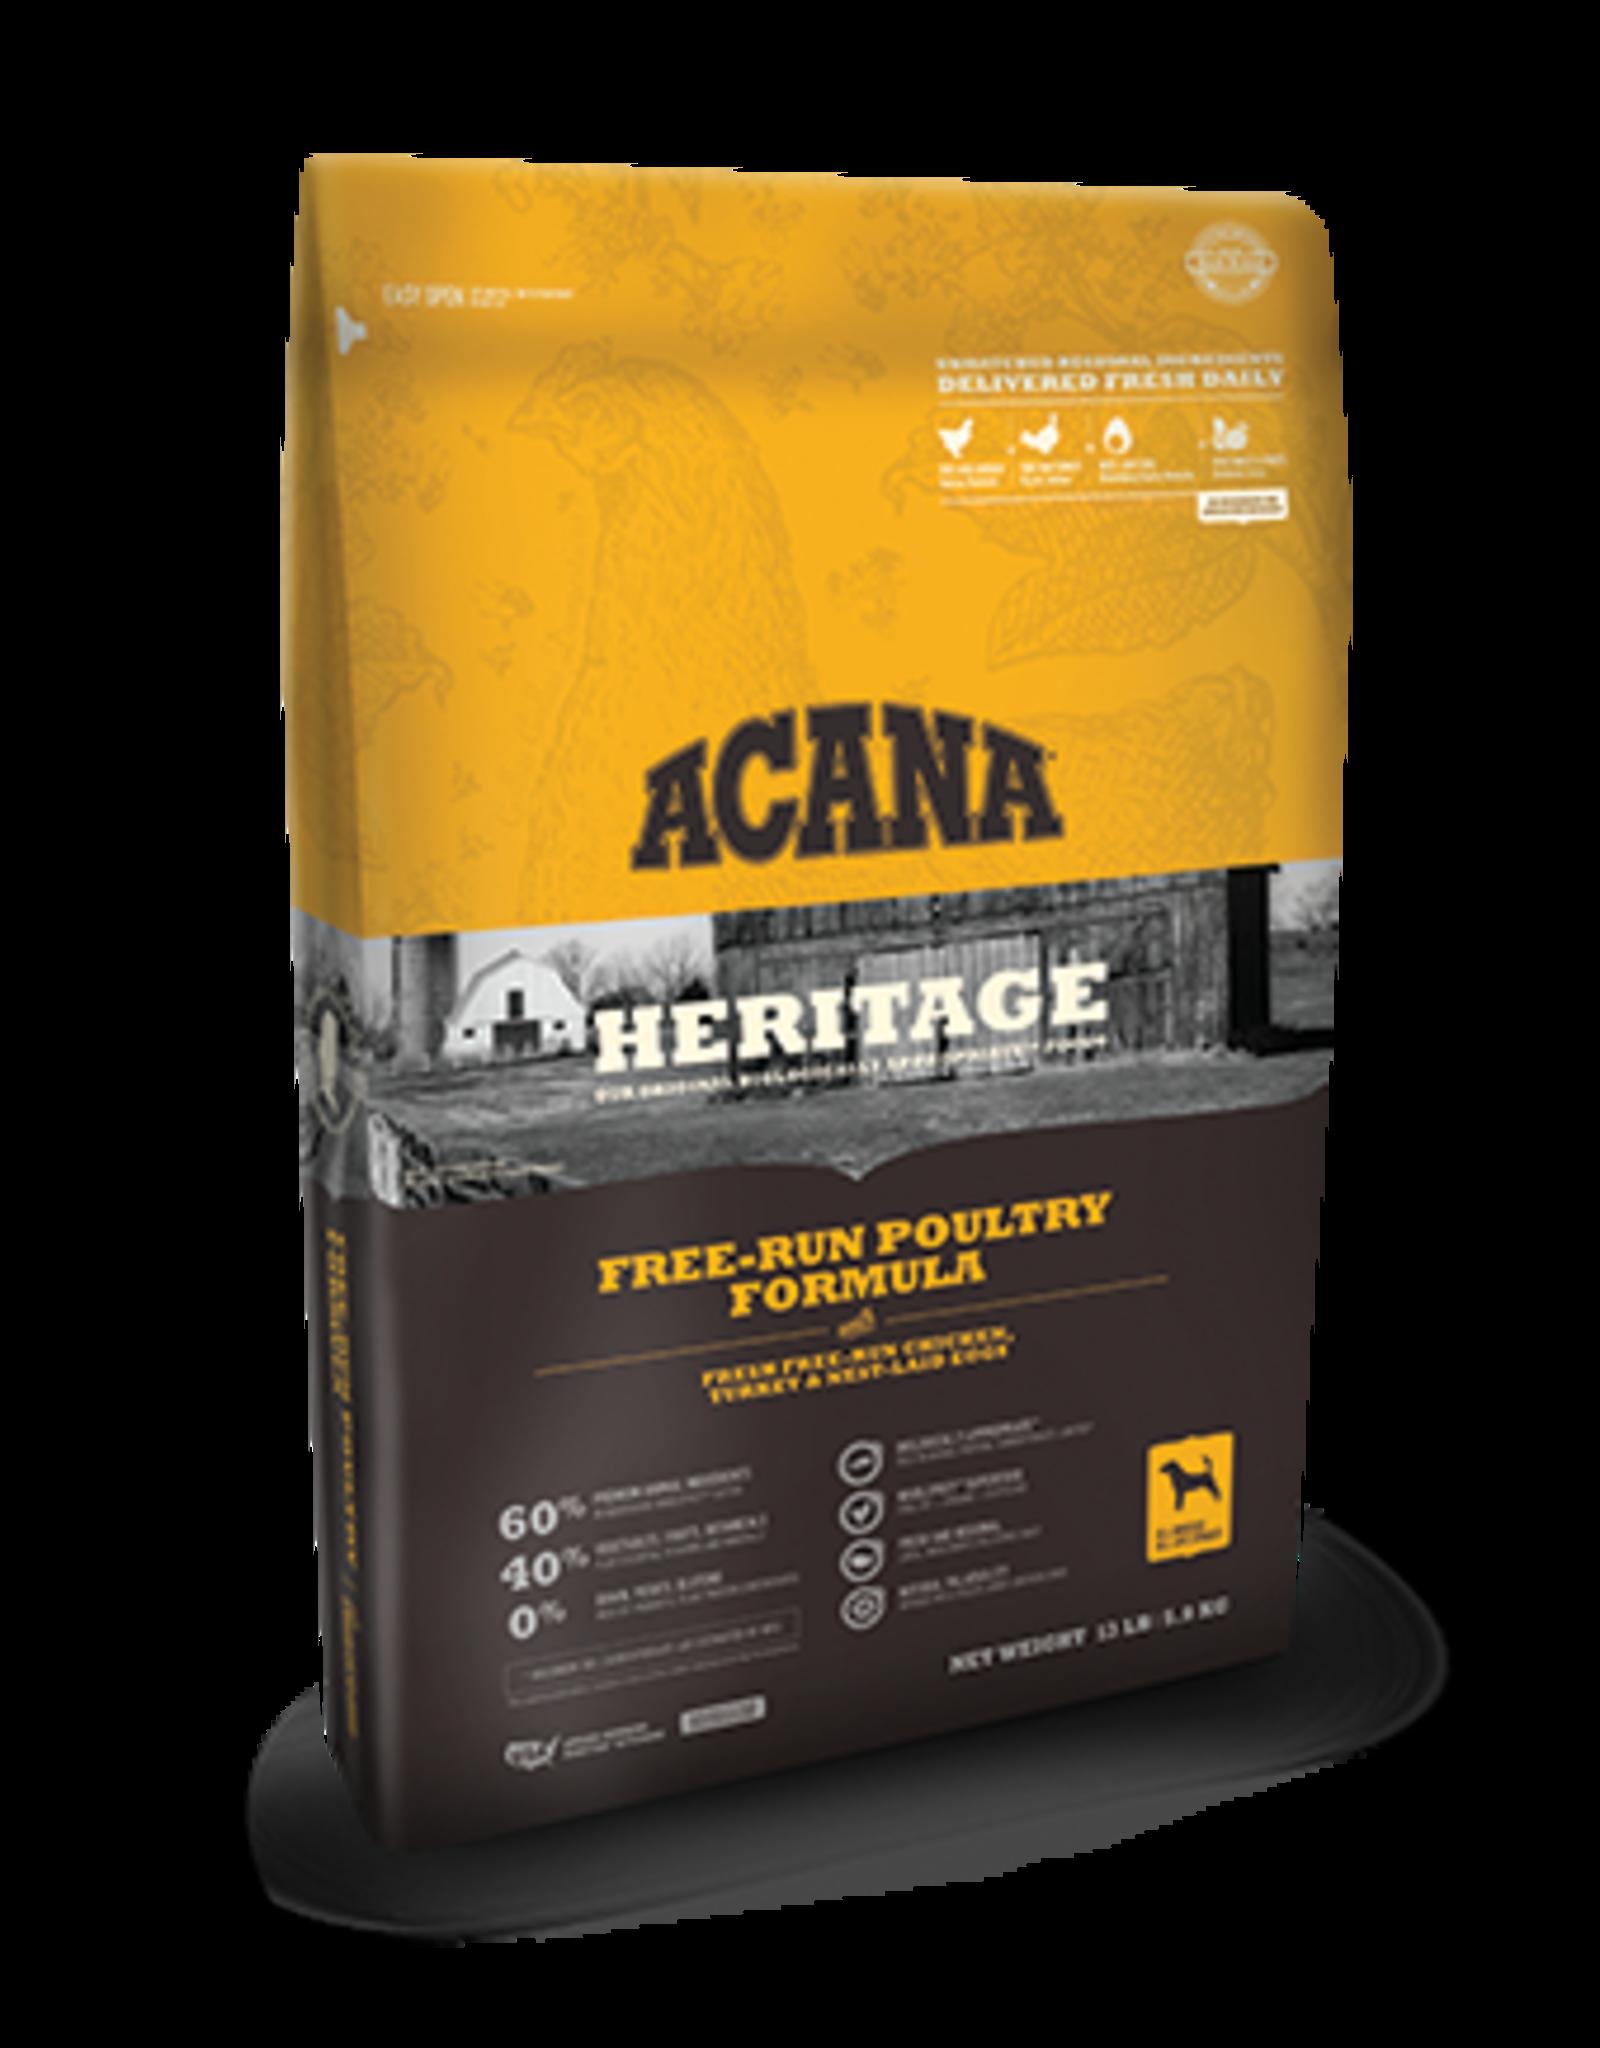 Acana Acana Heritage Dog Food Free-Run Poultry